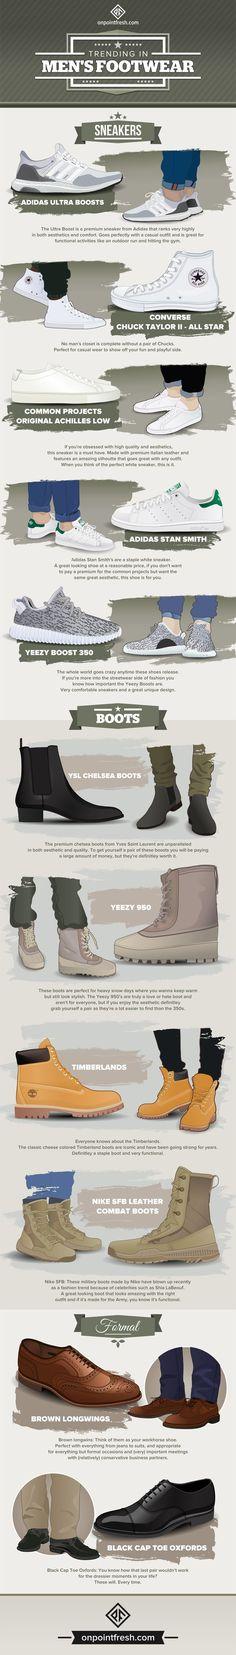 Men's sneakers Men's Footwear Men's formal shoes, dress shoes